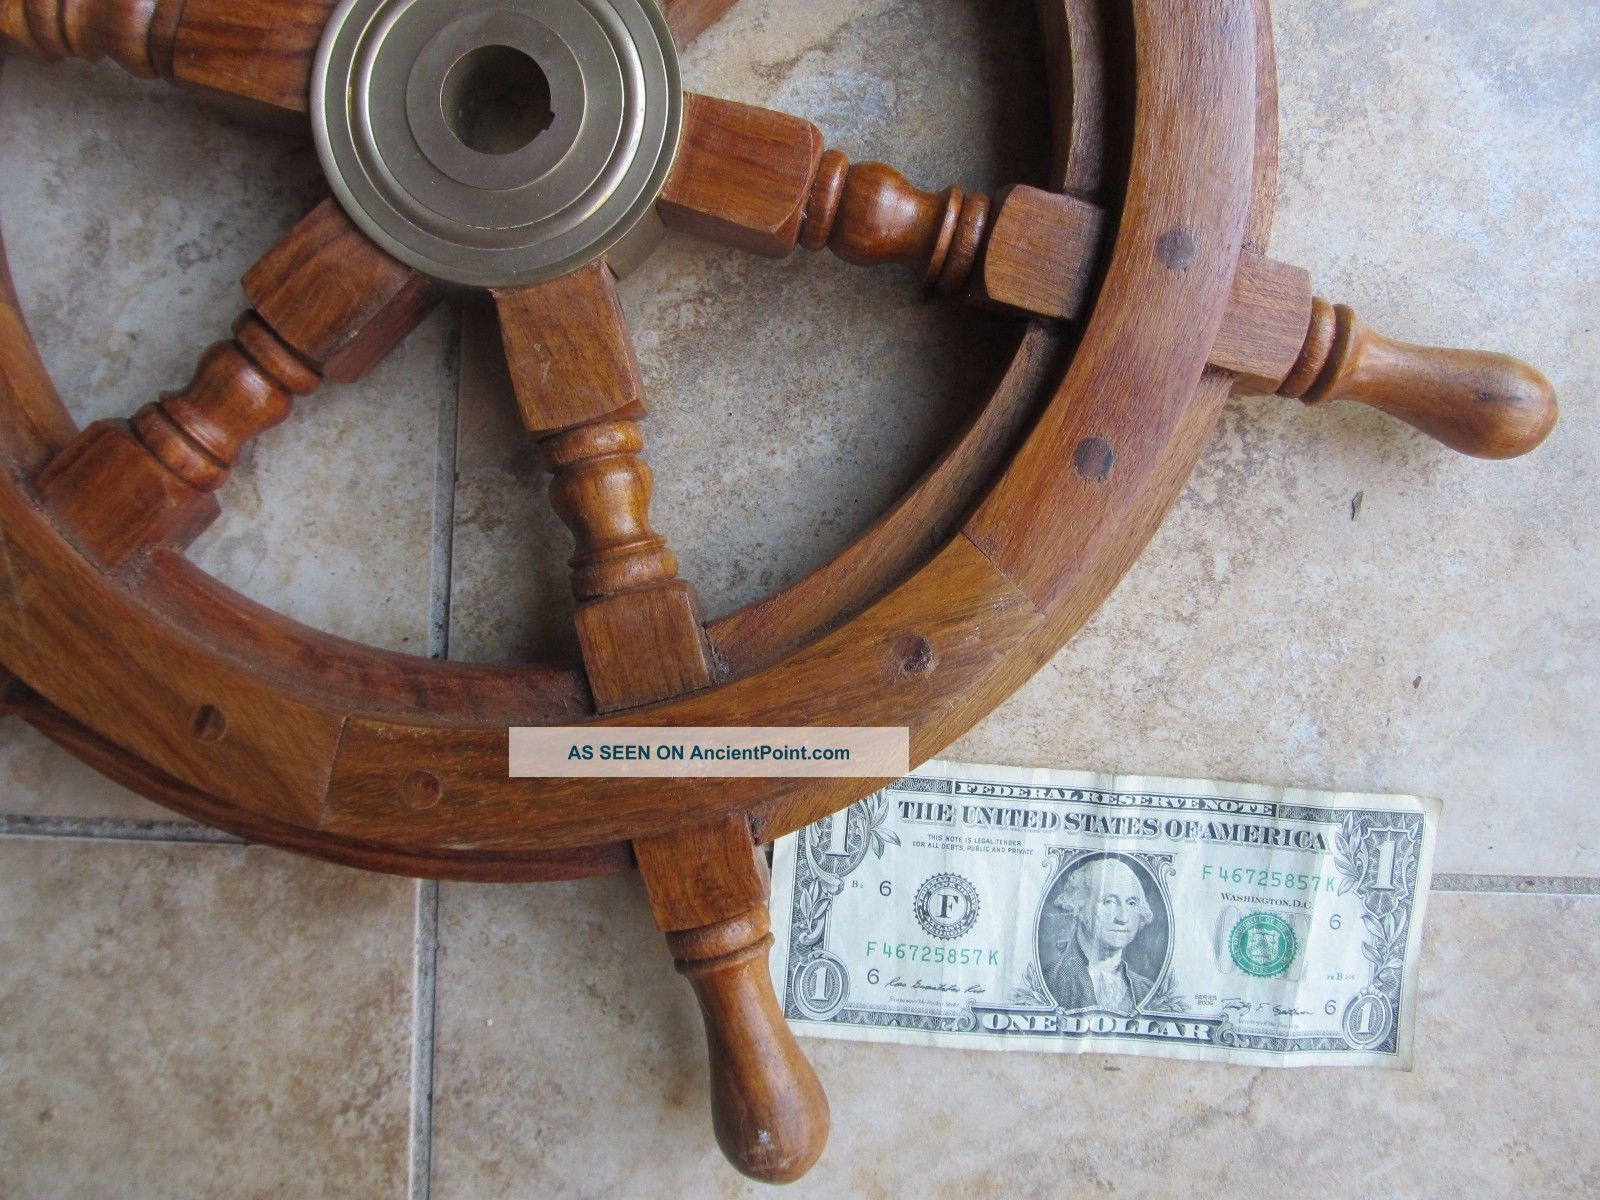 Decorative Vintage Wooden Ship ' S Wheel,  Maritime,  Nautical,  Boat,  Brass Hub Wheels photo